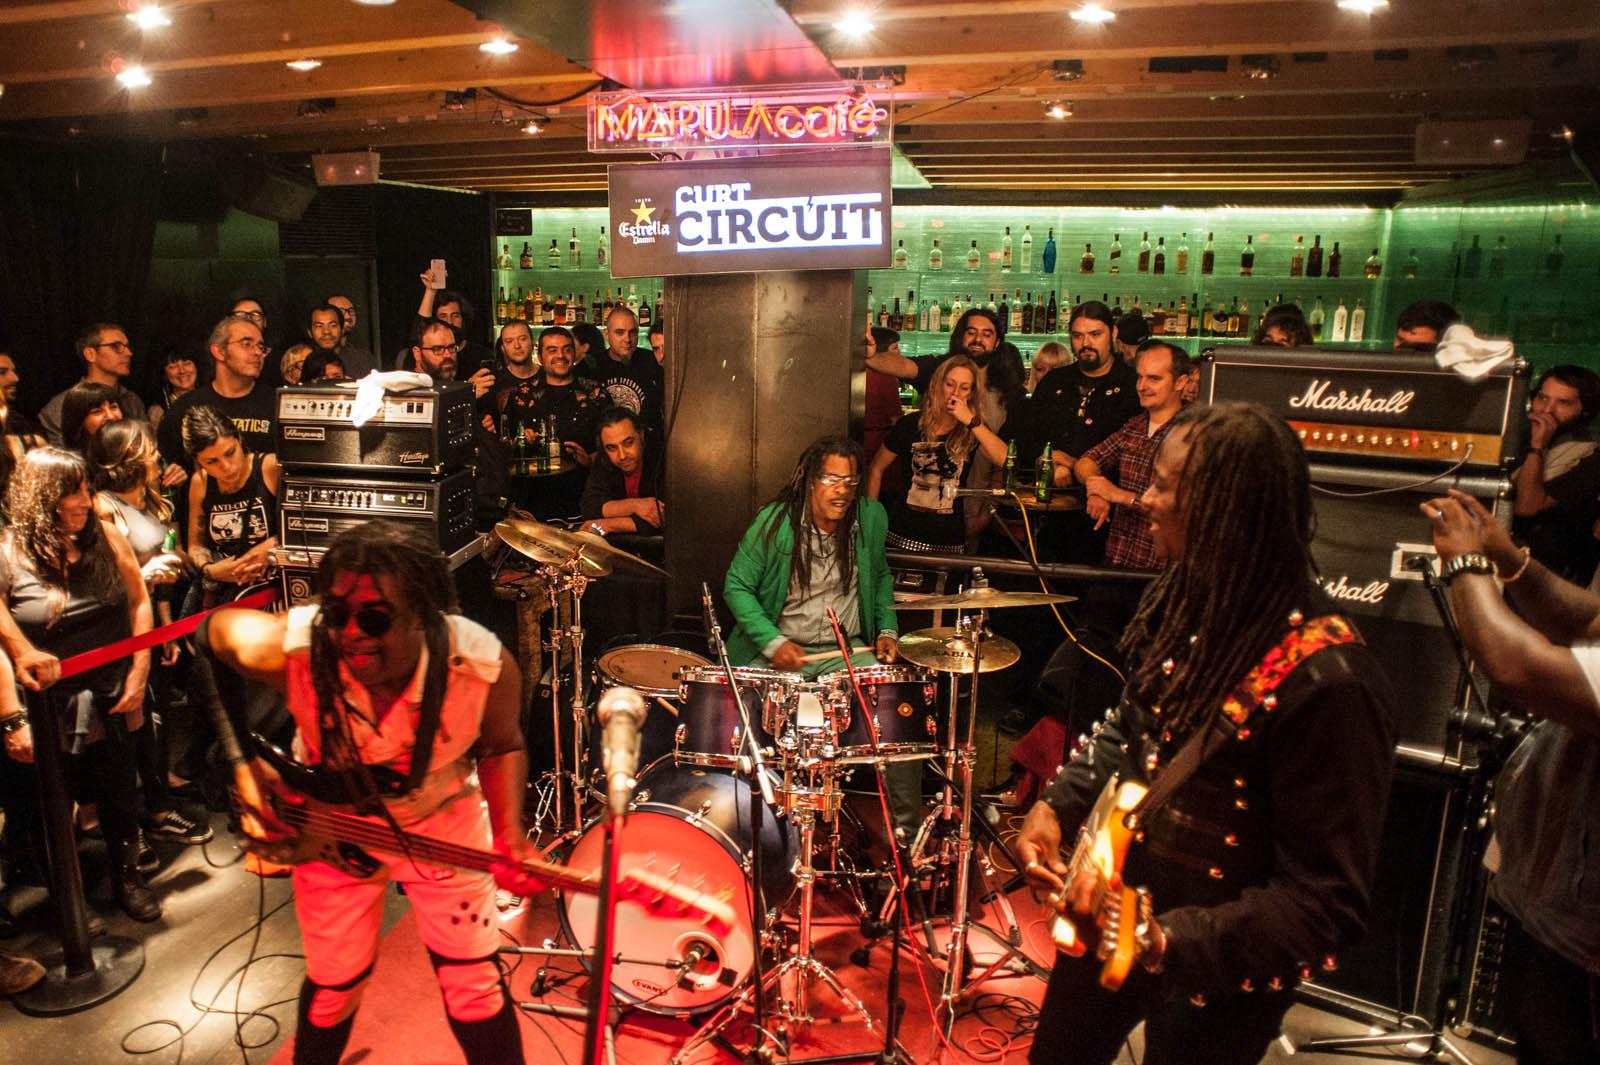 concert-death-curtcircuit-marula-cafe-barcelona-qualsevol-nit